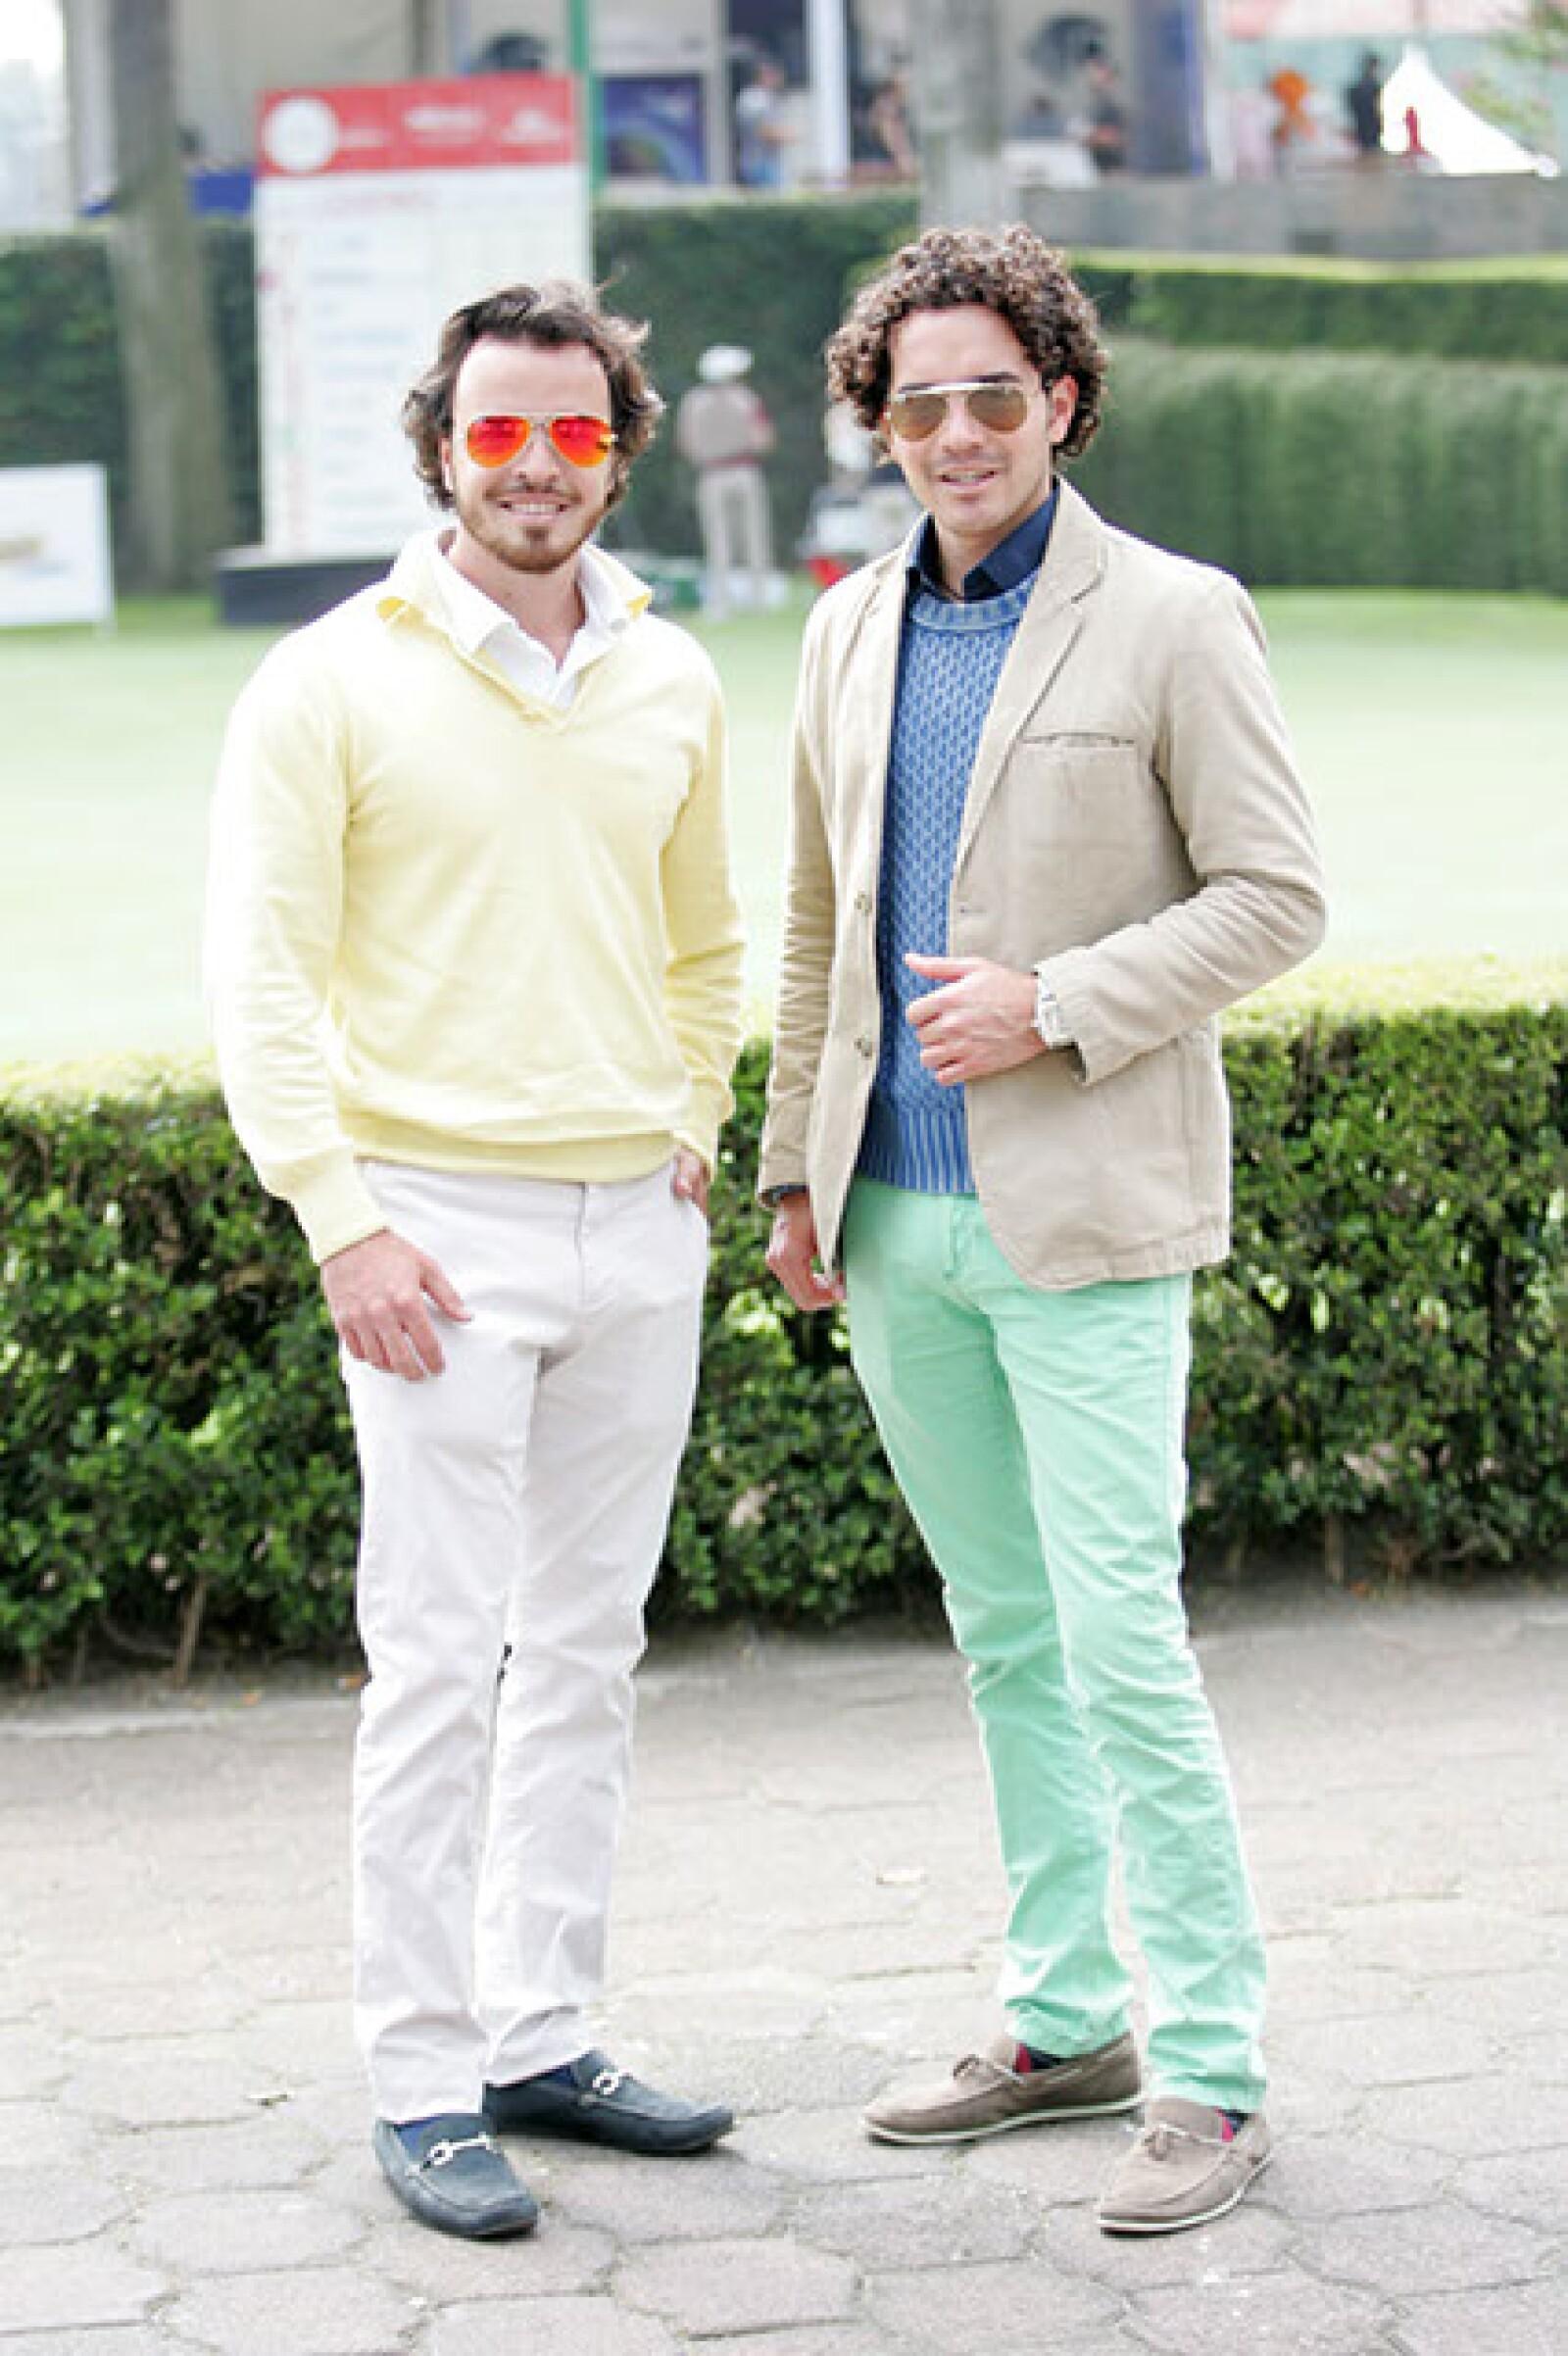 Fredy Vivanco y Daniel Dávila